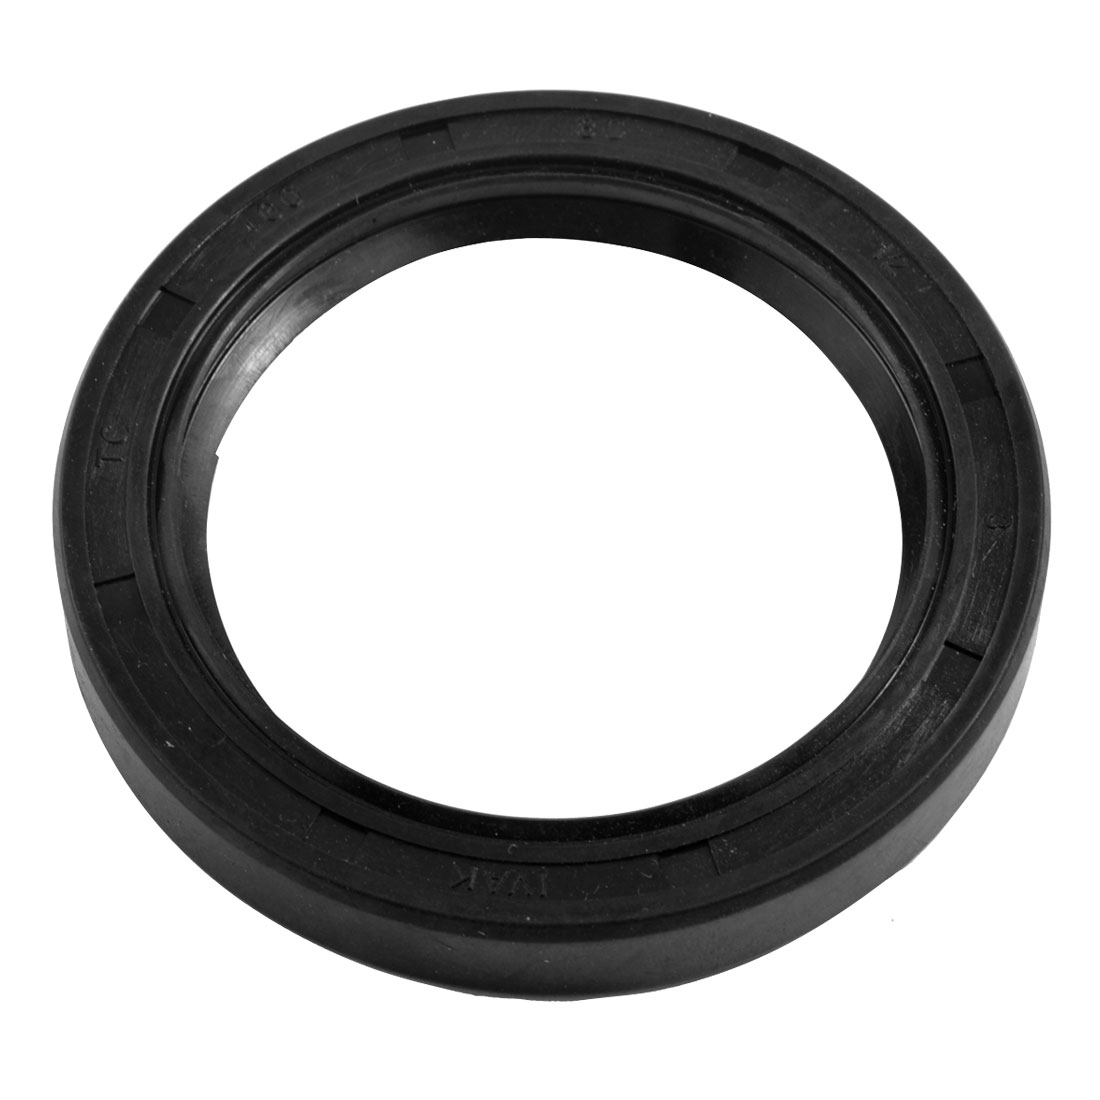 Black Nitrile Rubber Dual Lips Oil Shaft Seal TC 60mm x 80mm x 12mm